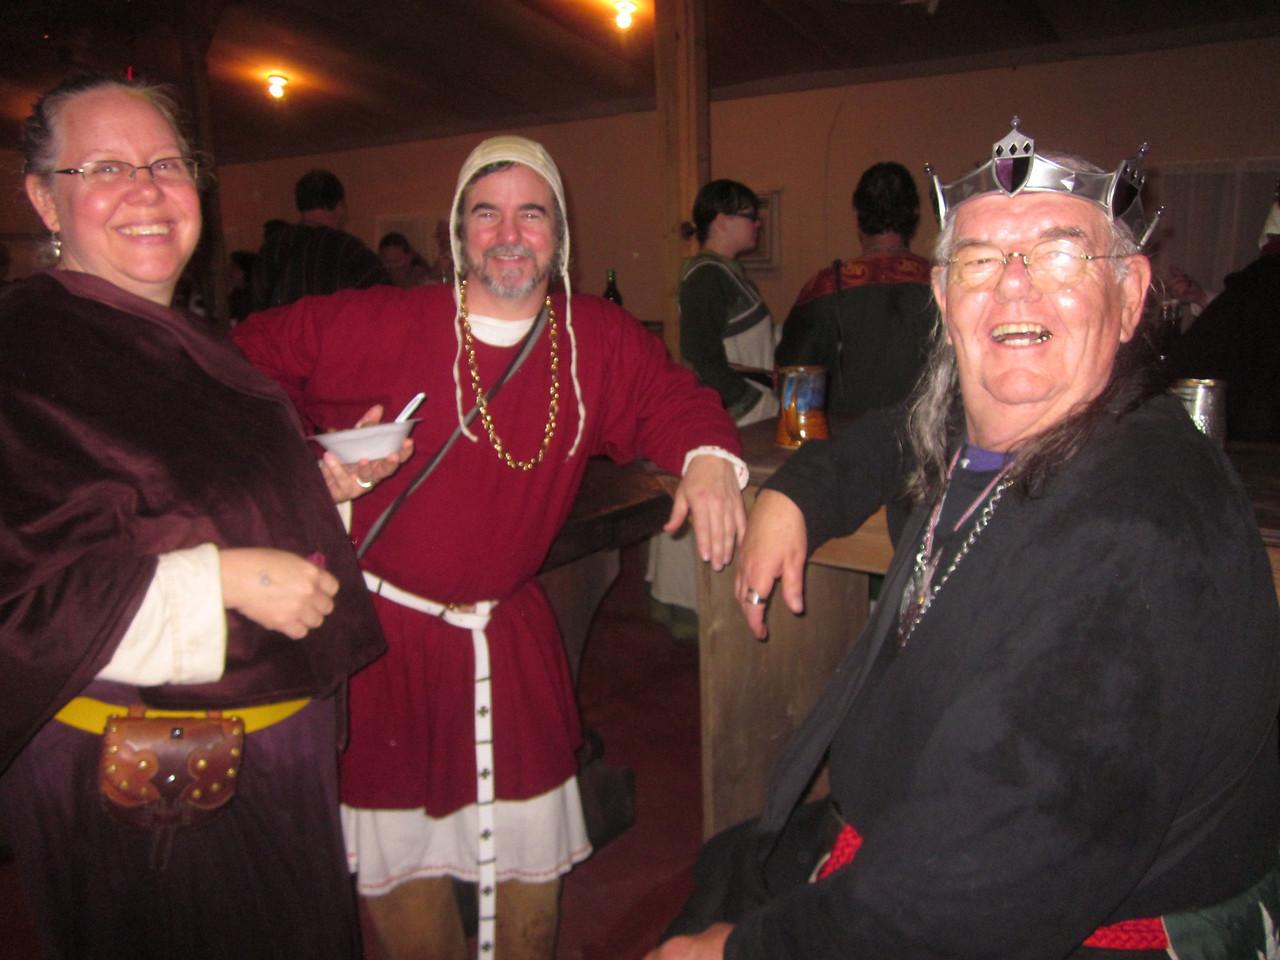 Melissant, Grim, & Nigel